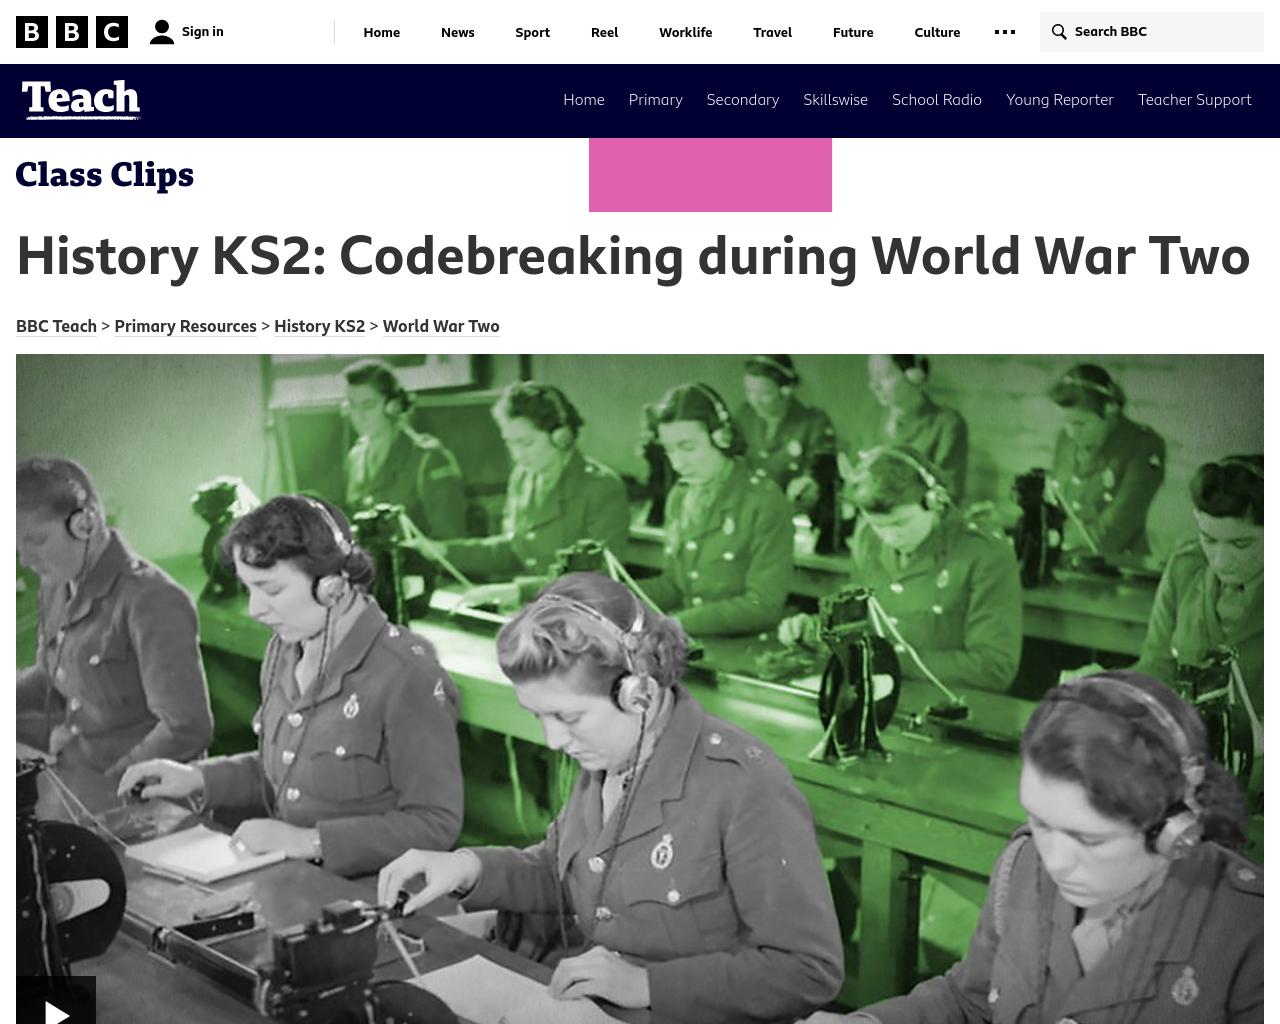 Codebreaking during WW2